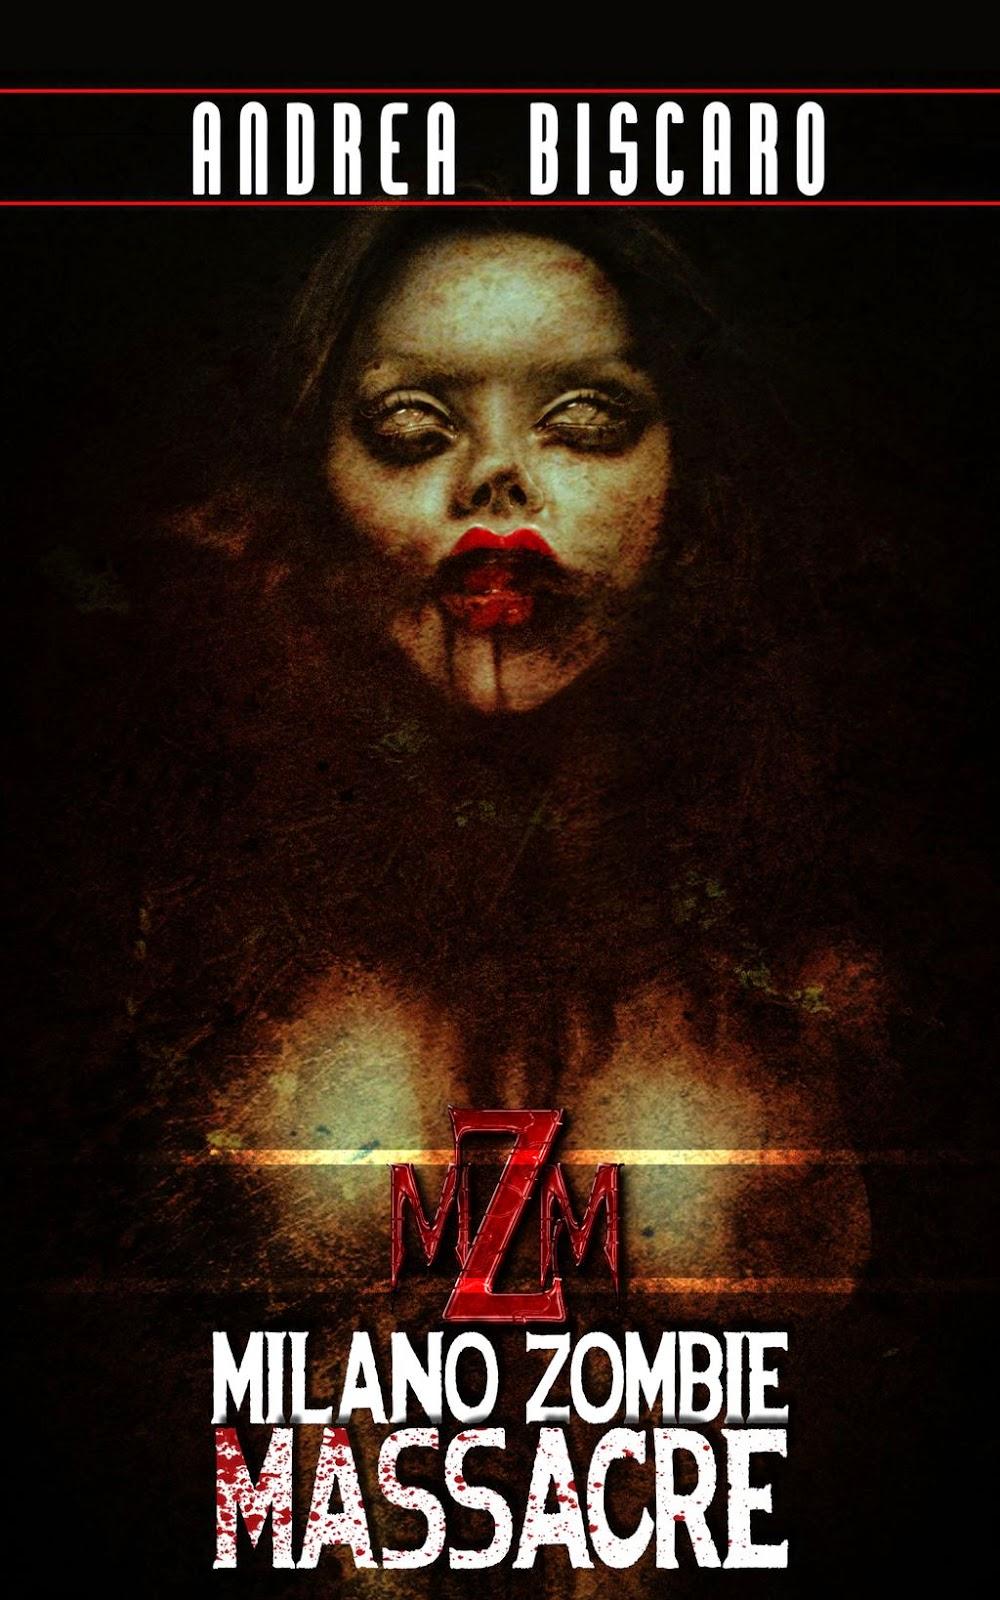 Milano Zombie Massacre (MZM)